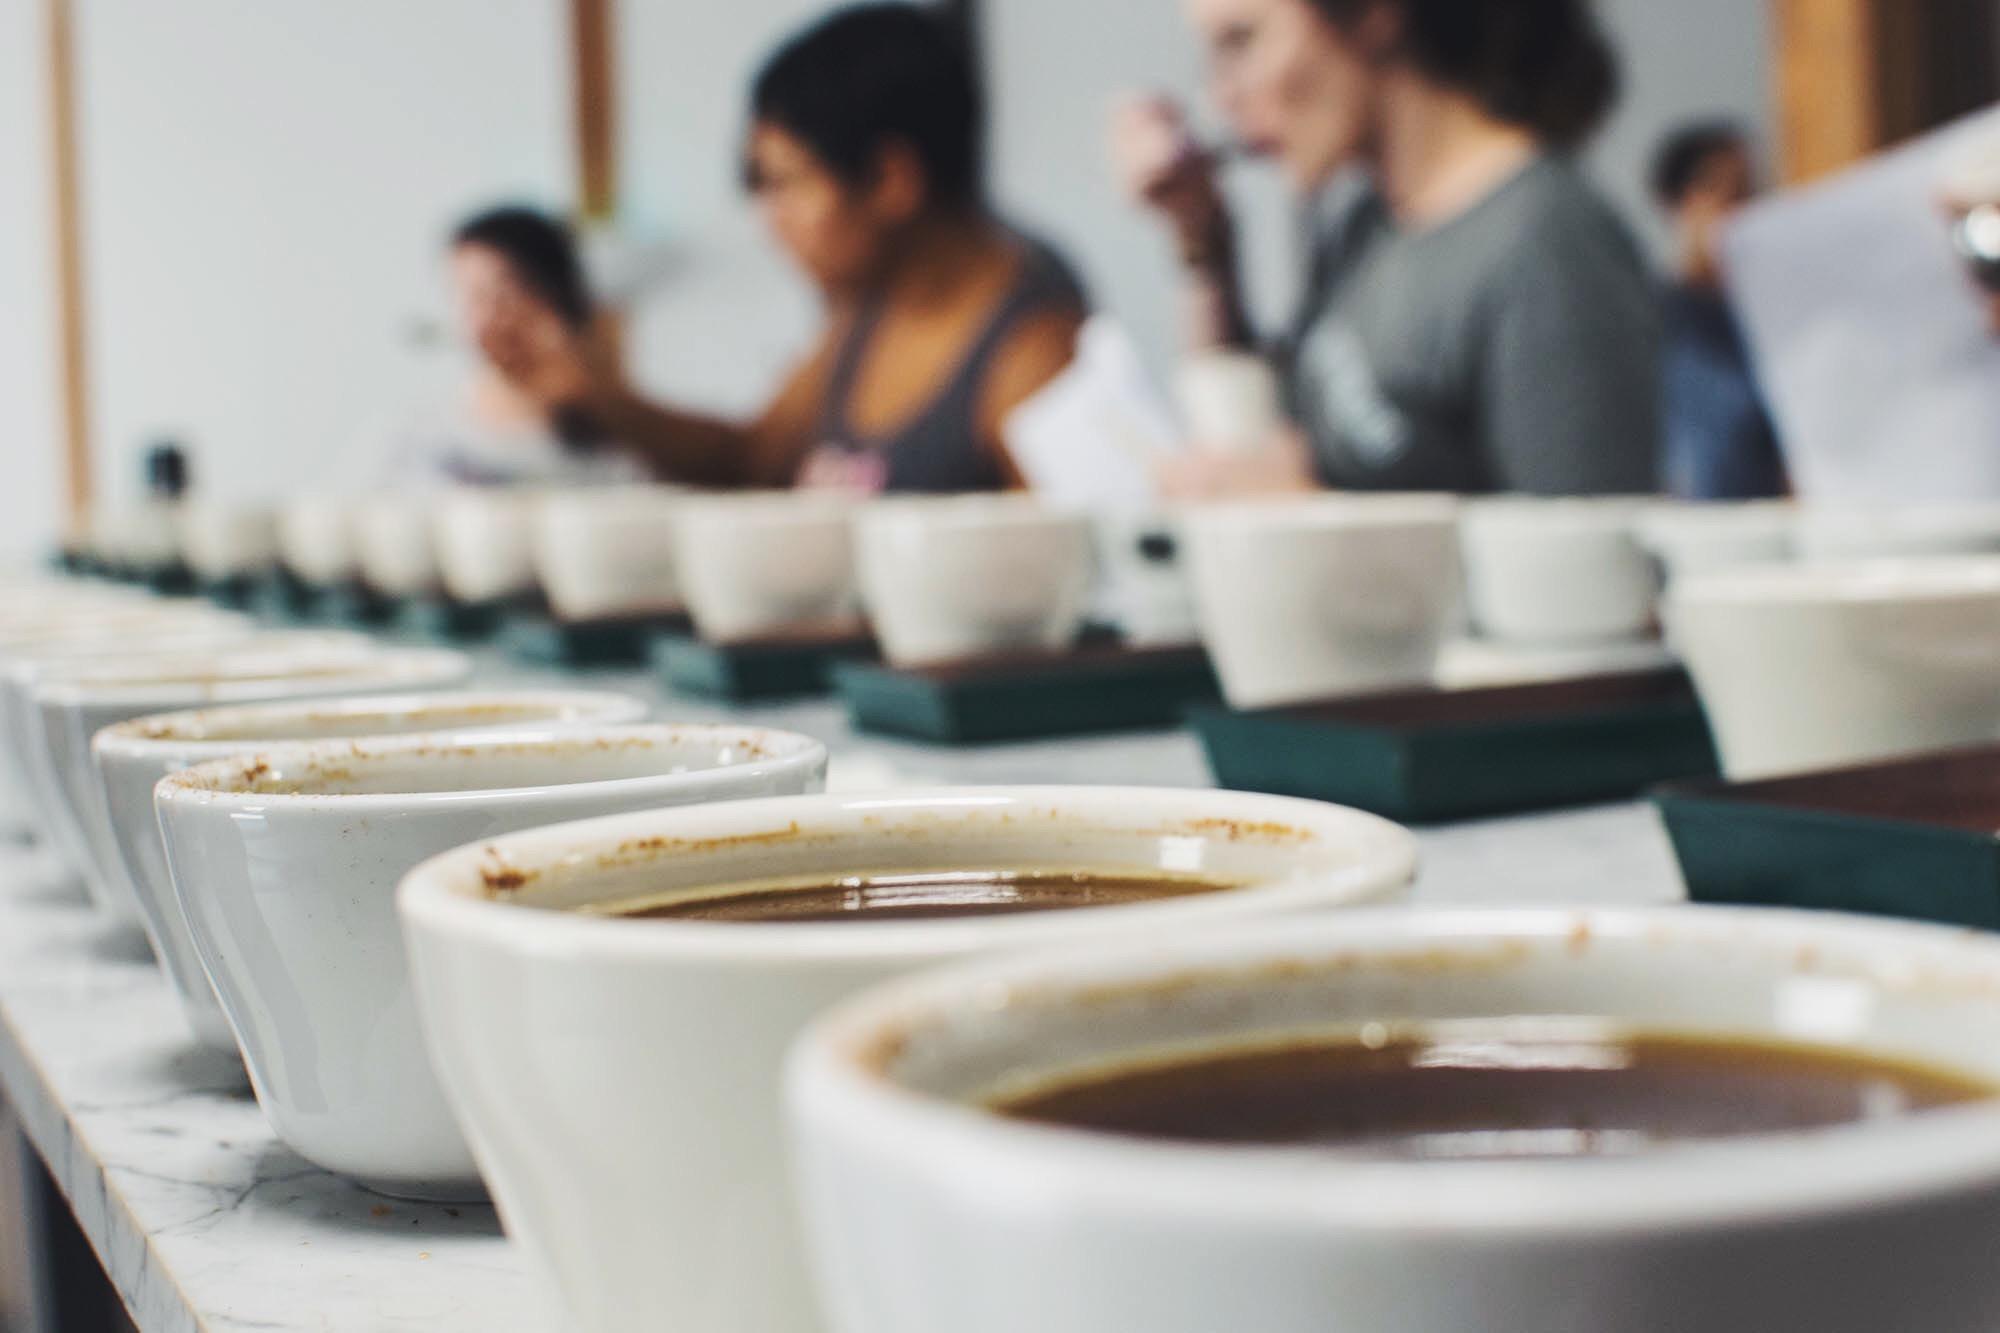 Photo via Royal Coffee